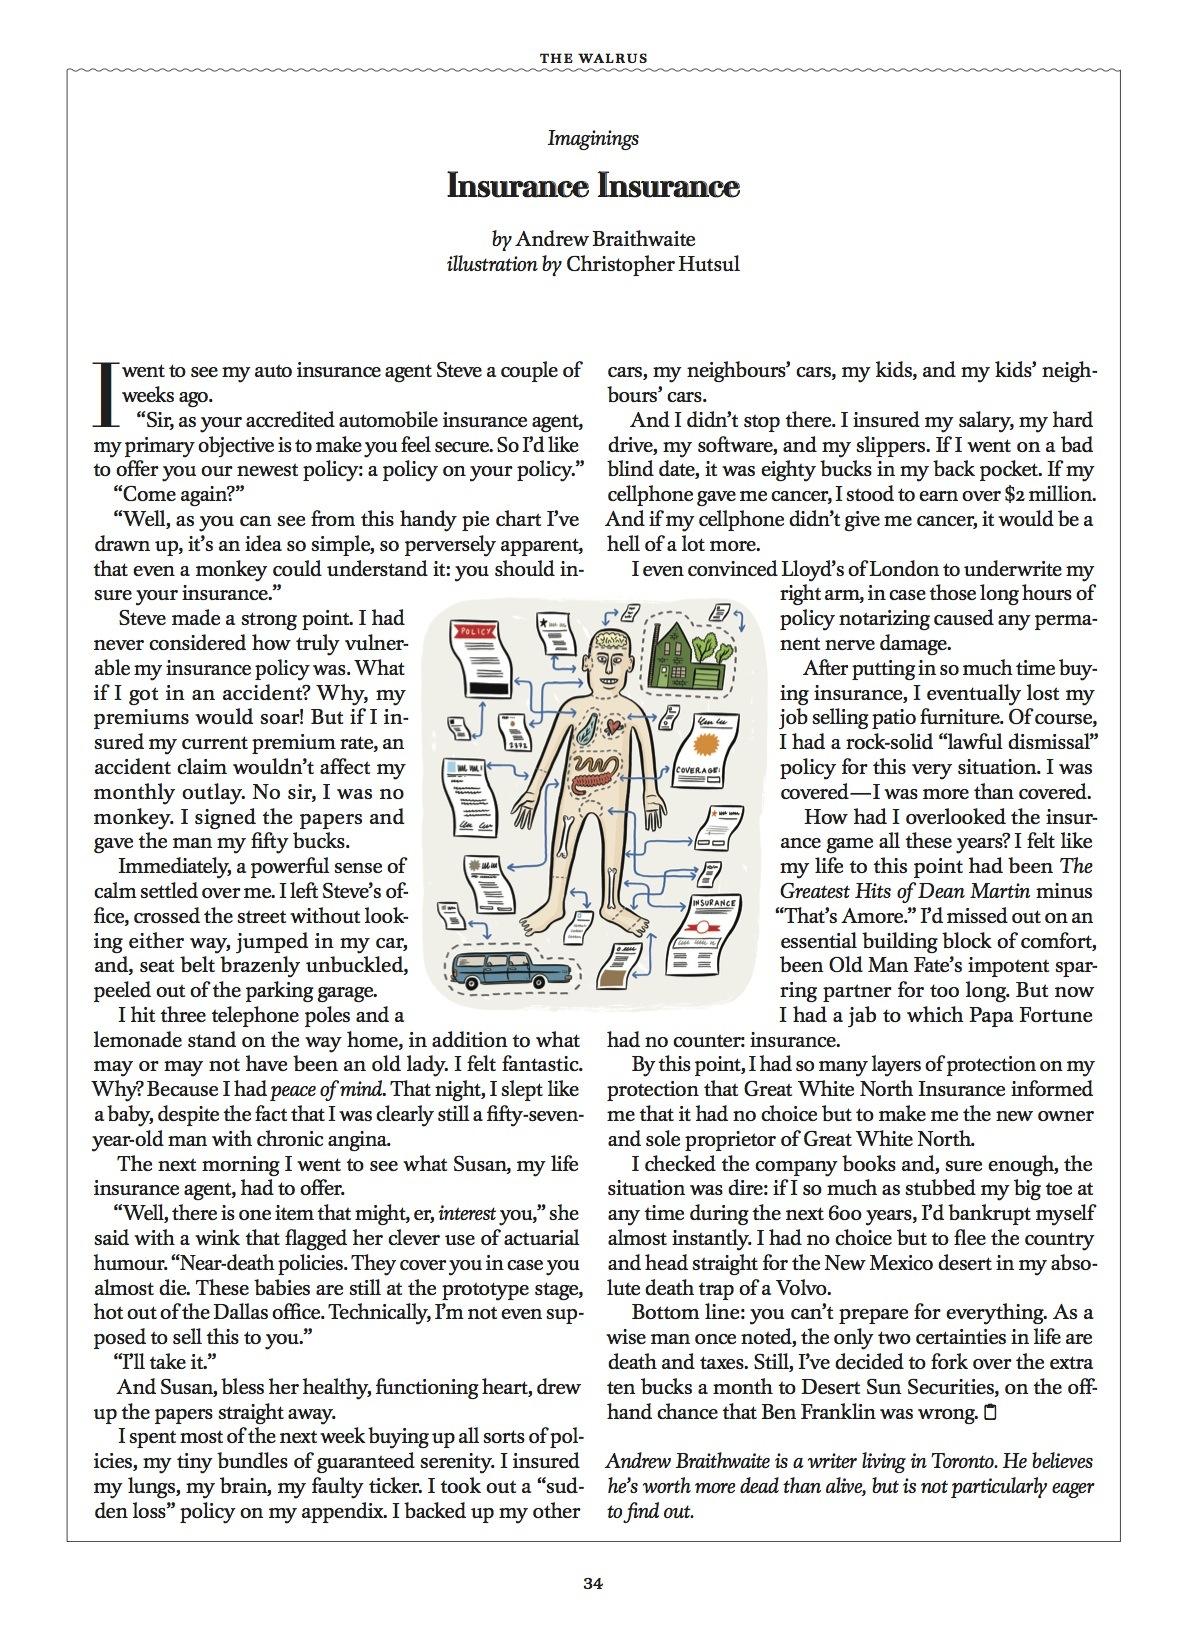 Insurance Insurance // The Walrus // 2006 // pdf